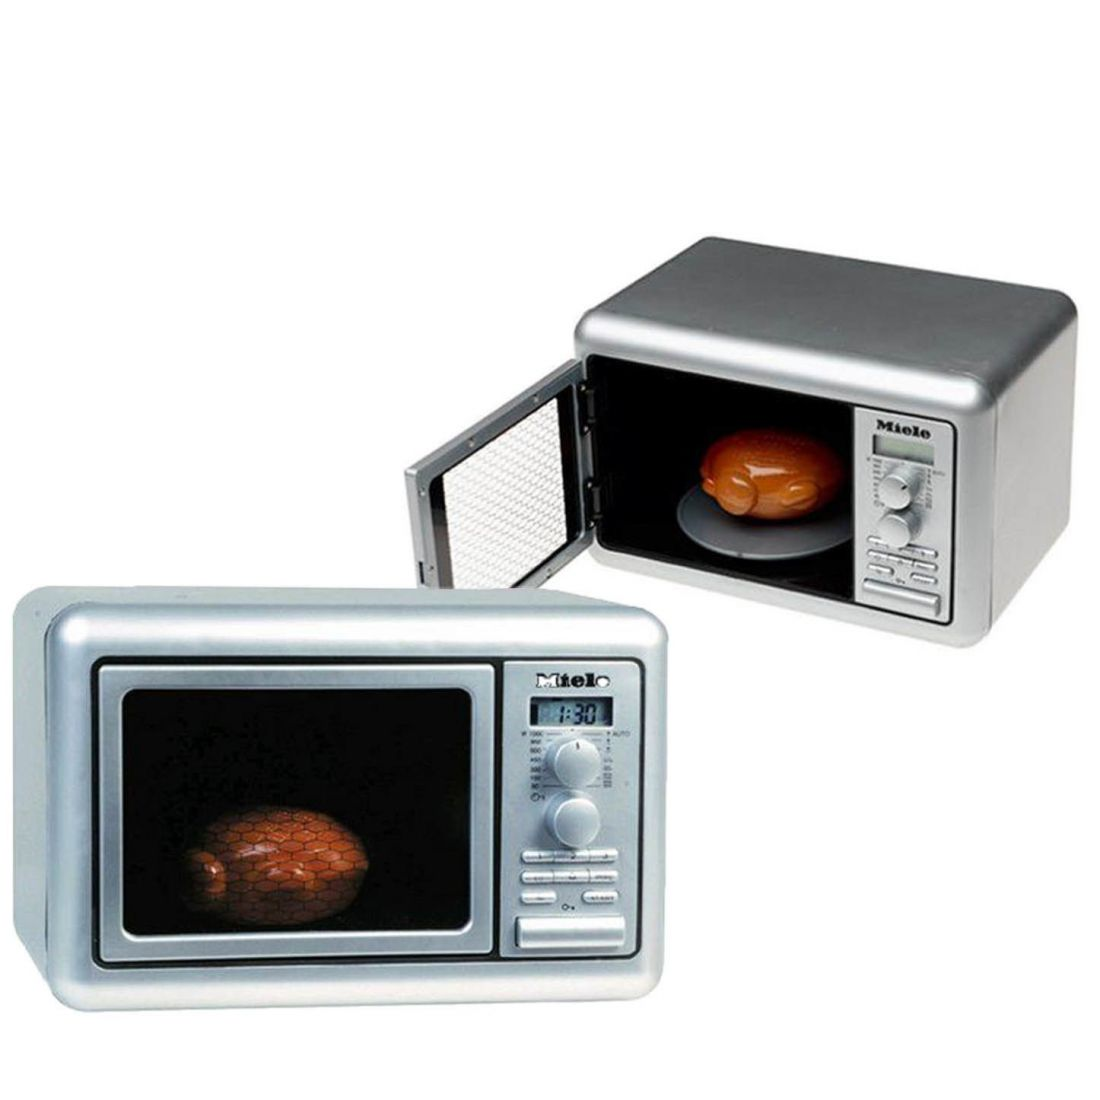 Микроволновая печь MIELE Klein 9492